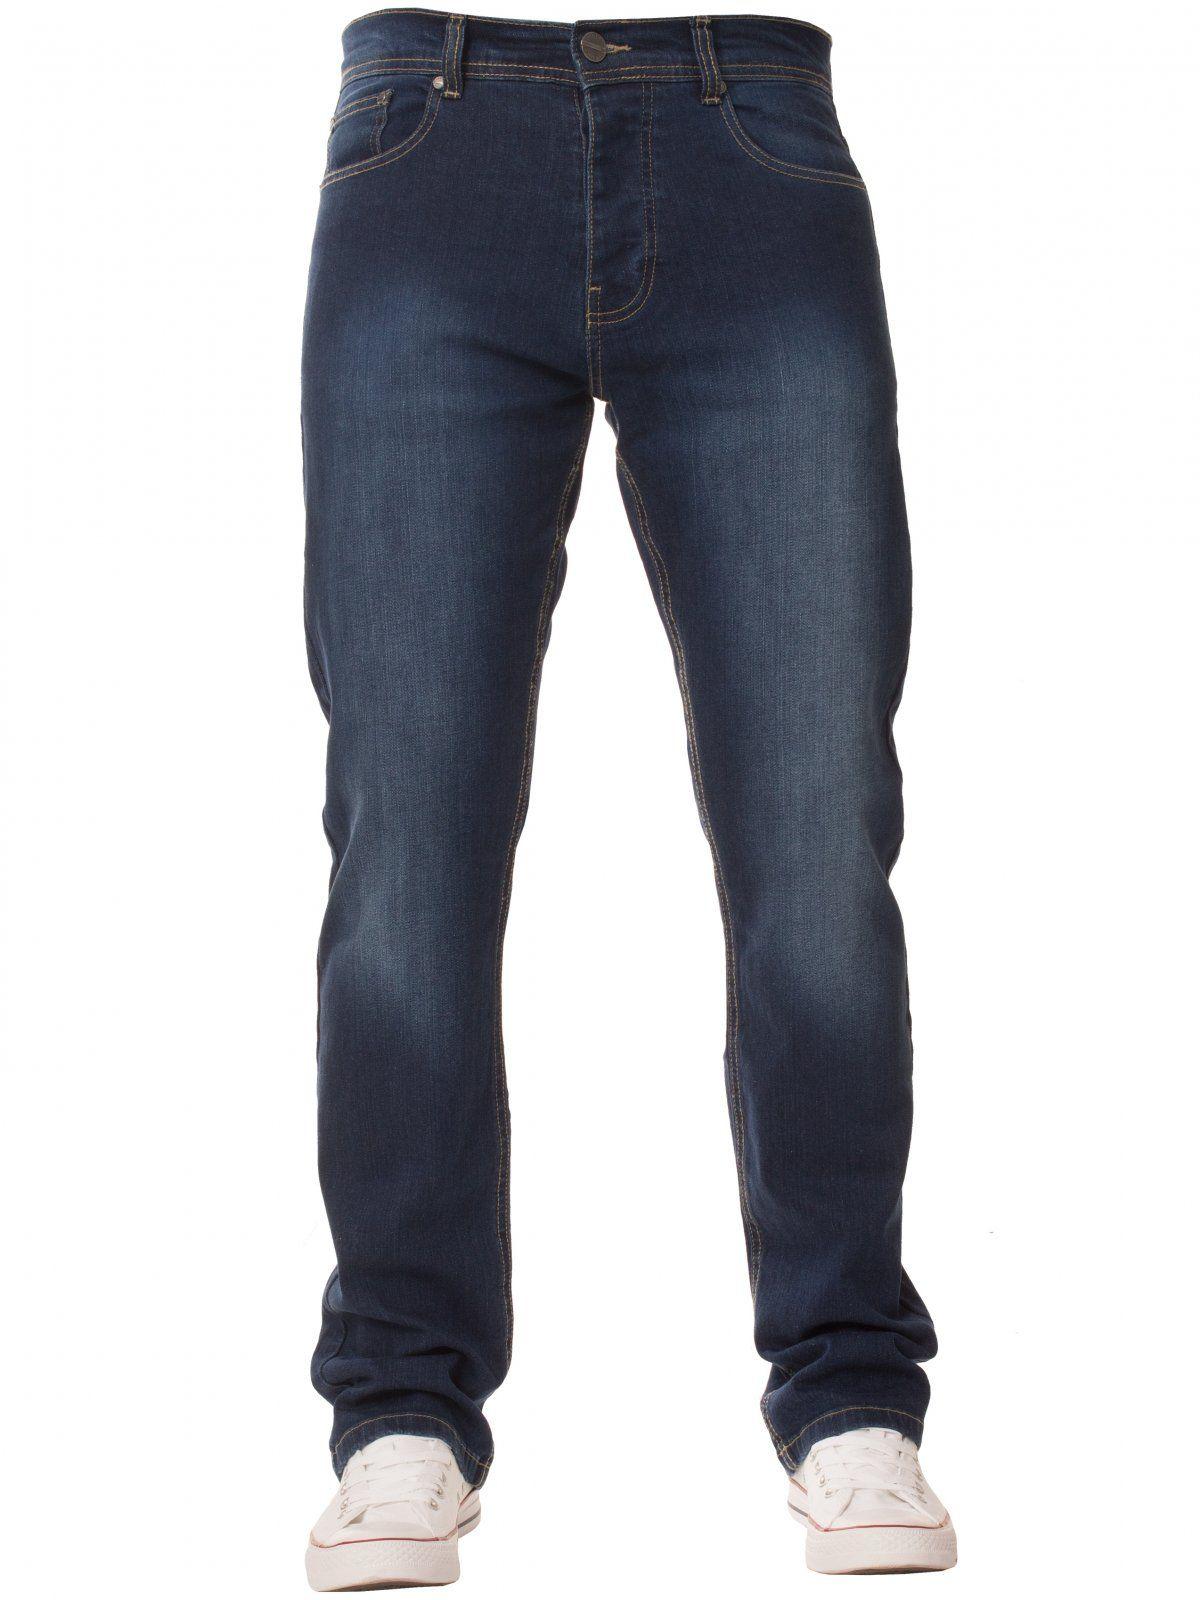 Mens  Regular Fit Stretch Denim Jeans   Enzo Designer Menswear